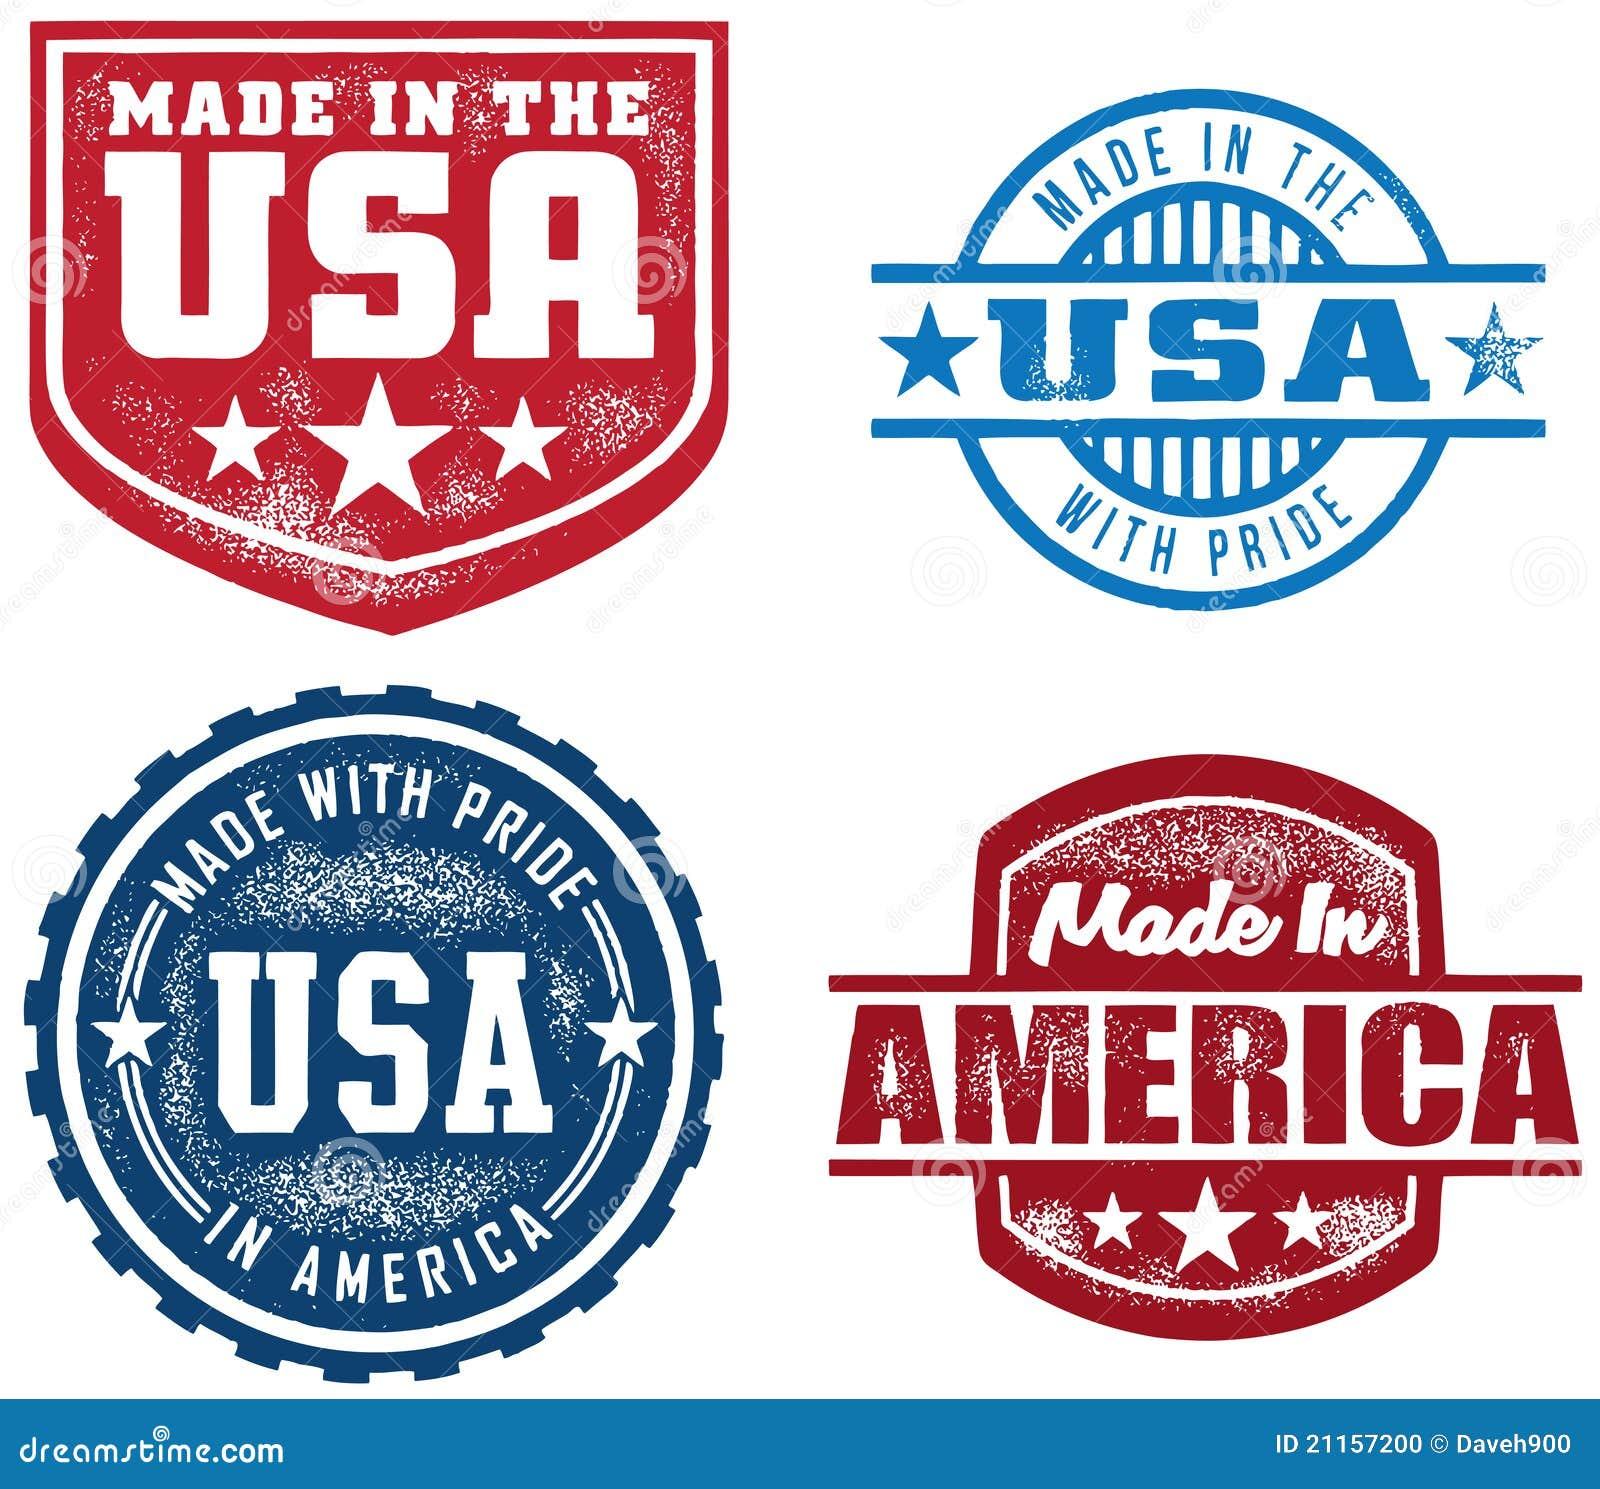 vintage style made in usa stamps stock vector illustration of america export 21157200. Black Bedroom Furniture Sets. Home Design Ideas